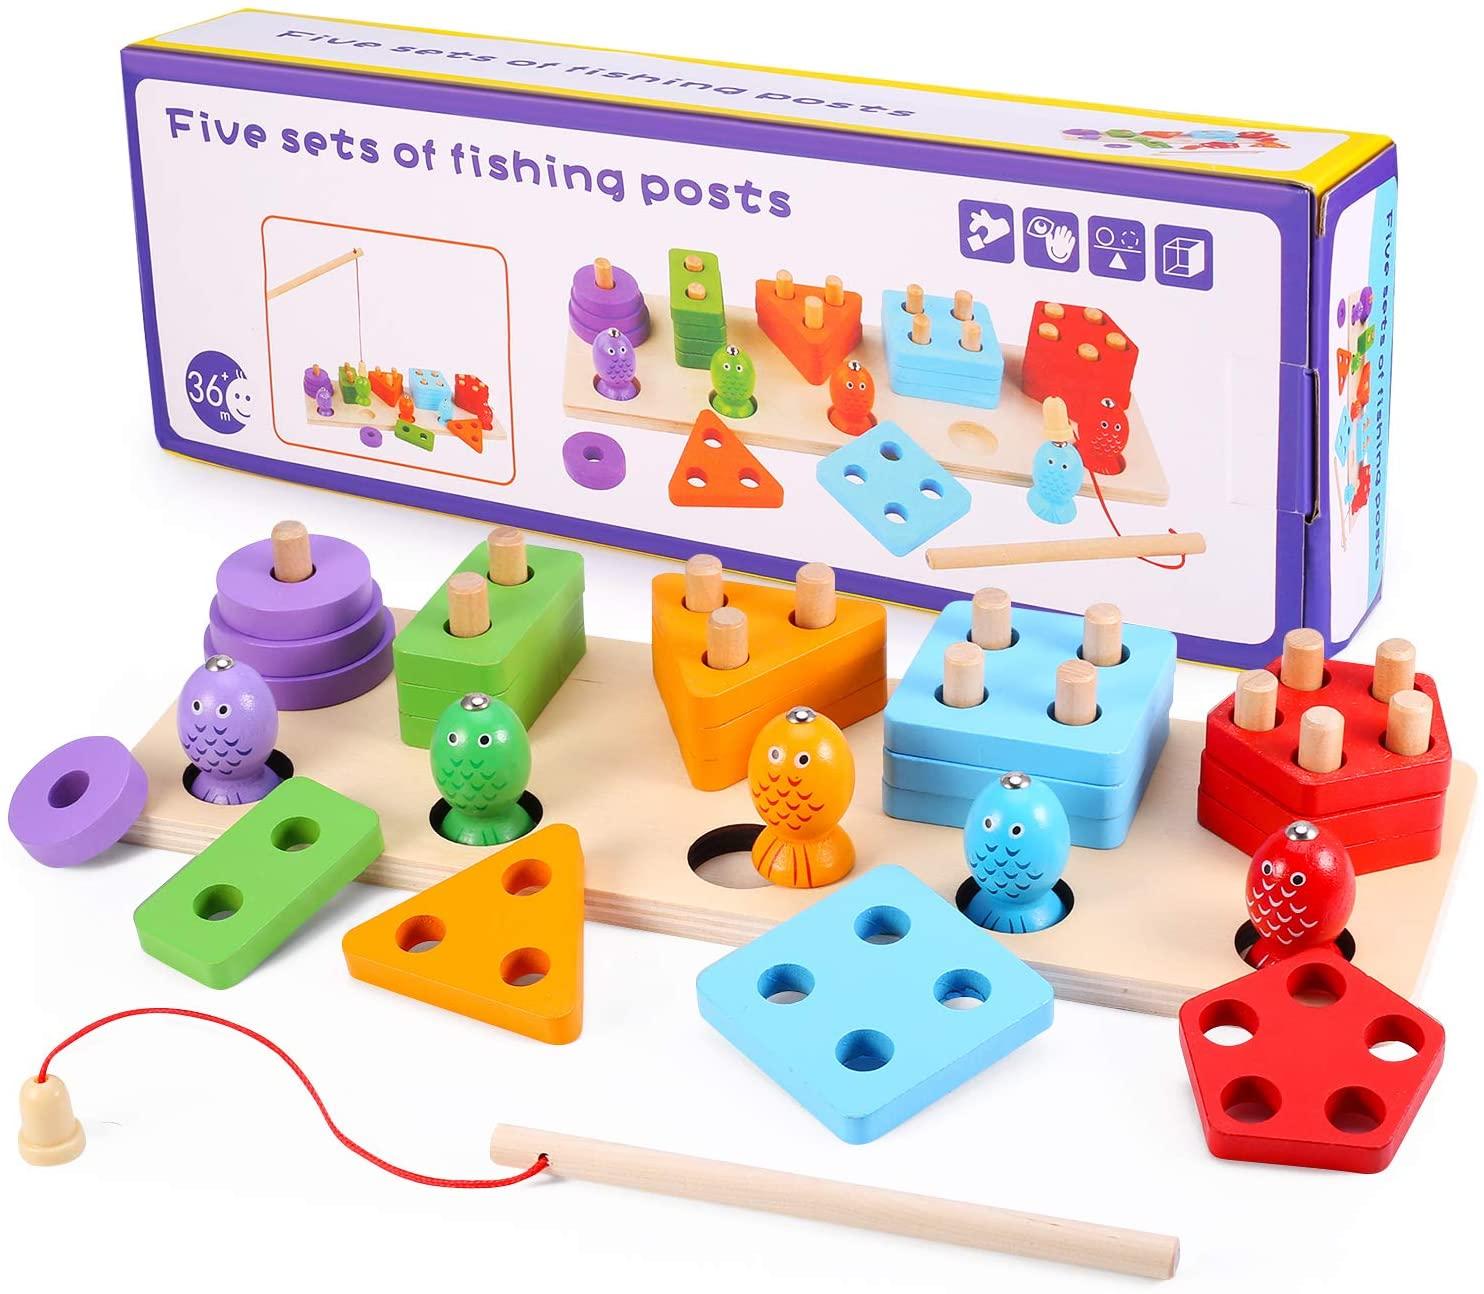 Young for U Wooden Educational Preschool Toddler Toys for 3 4 5 Year Old Boys Girls Shape Color Recognition Geometric Board Blocks Stack Sort Infant Learning Toys for Kids Children (JM5-new Model)